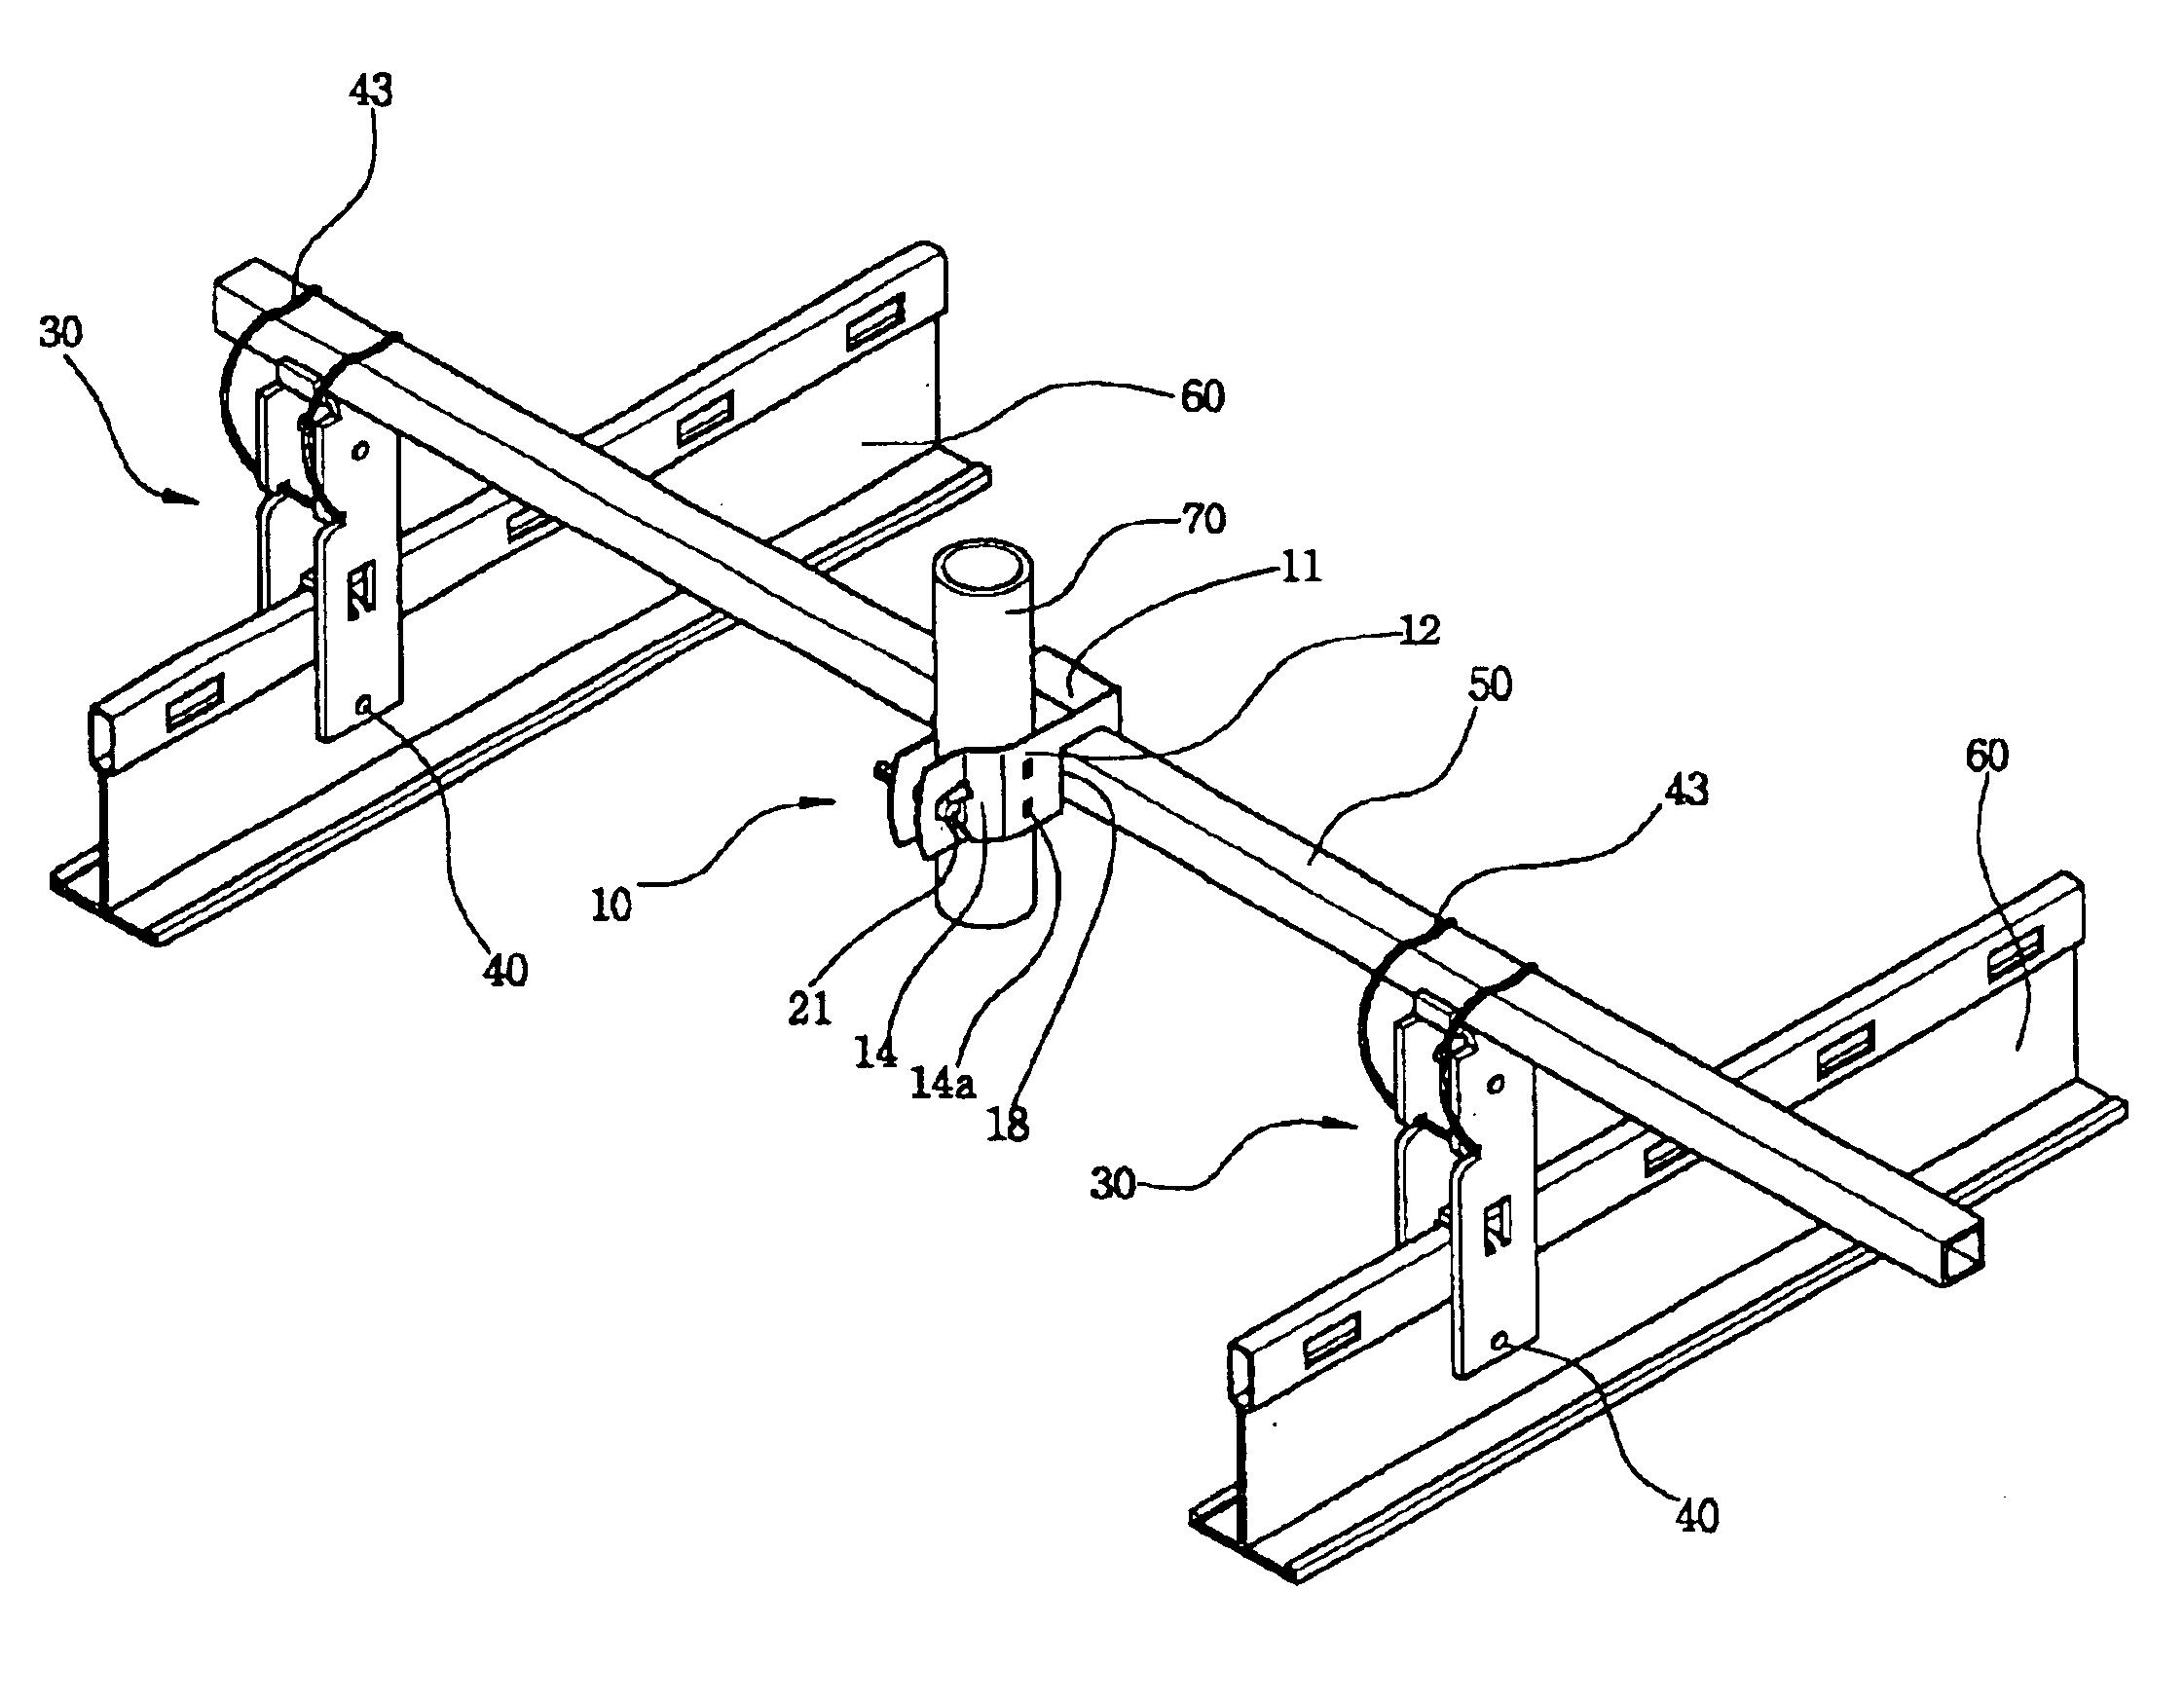 Mey ferguson 135 wiring diagram on s55 engine diagram